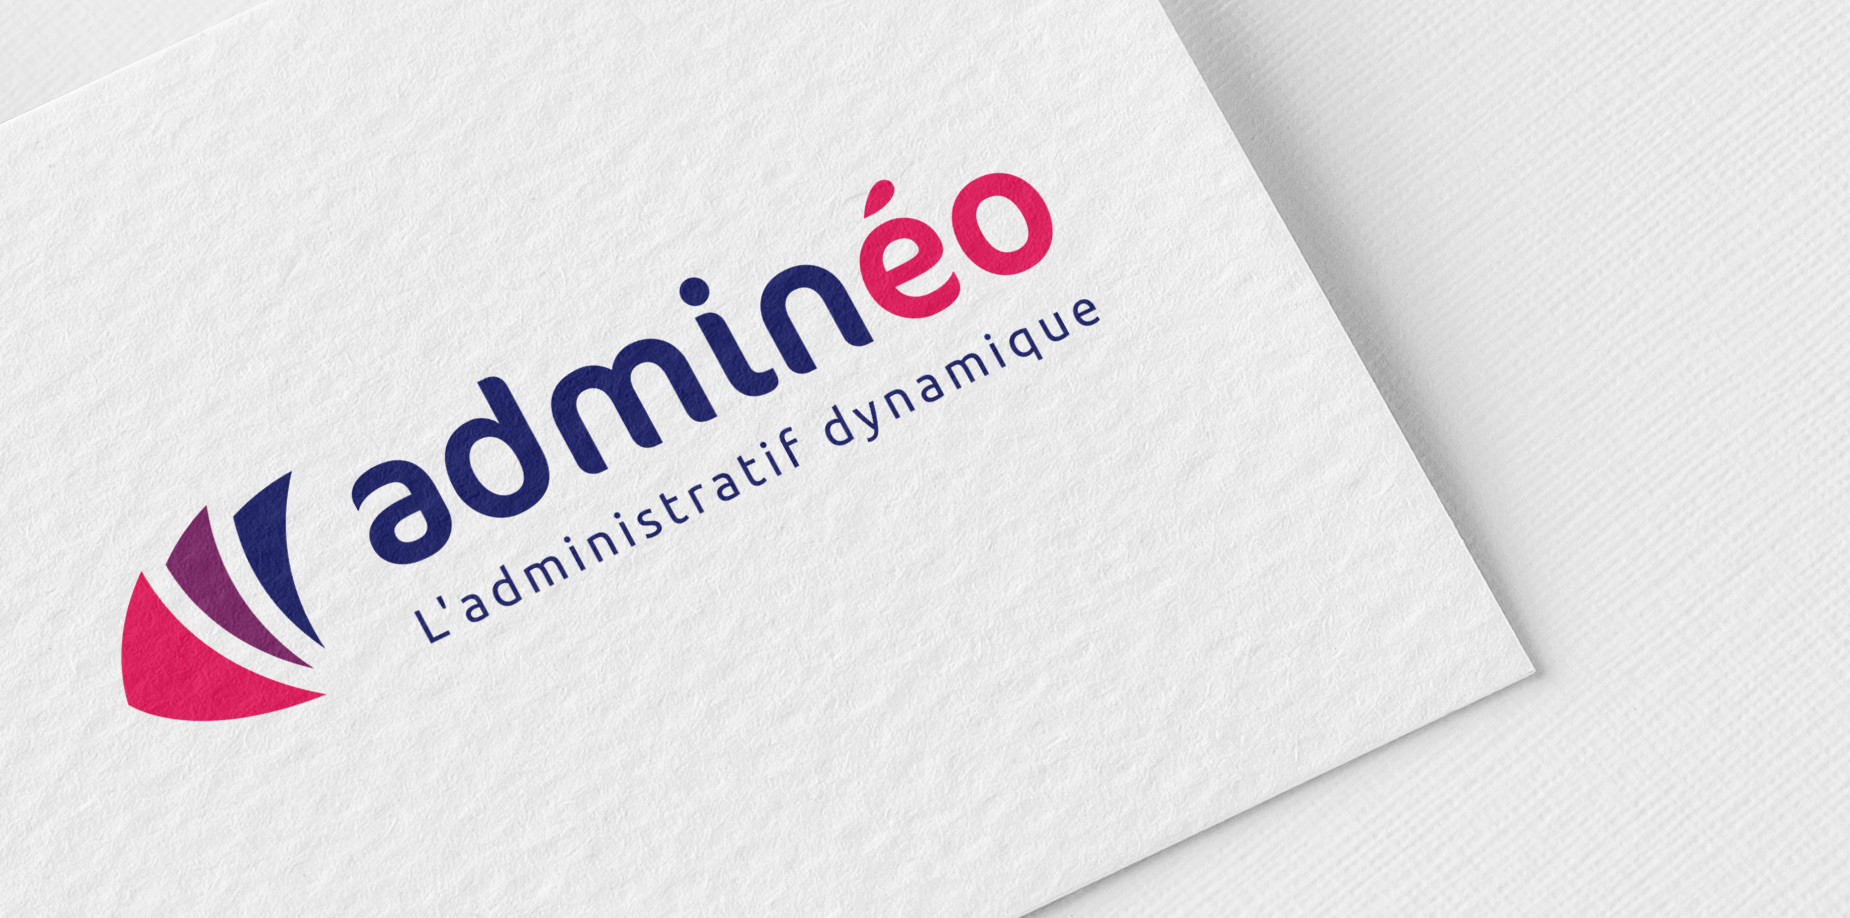 ikadia-portfolio-admineo-2